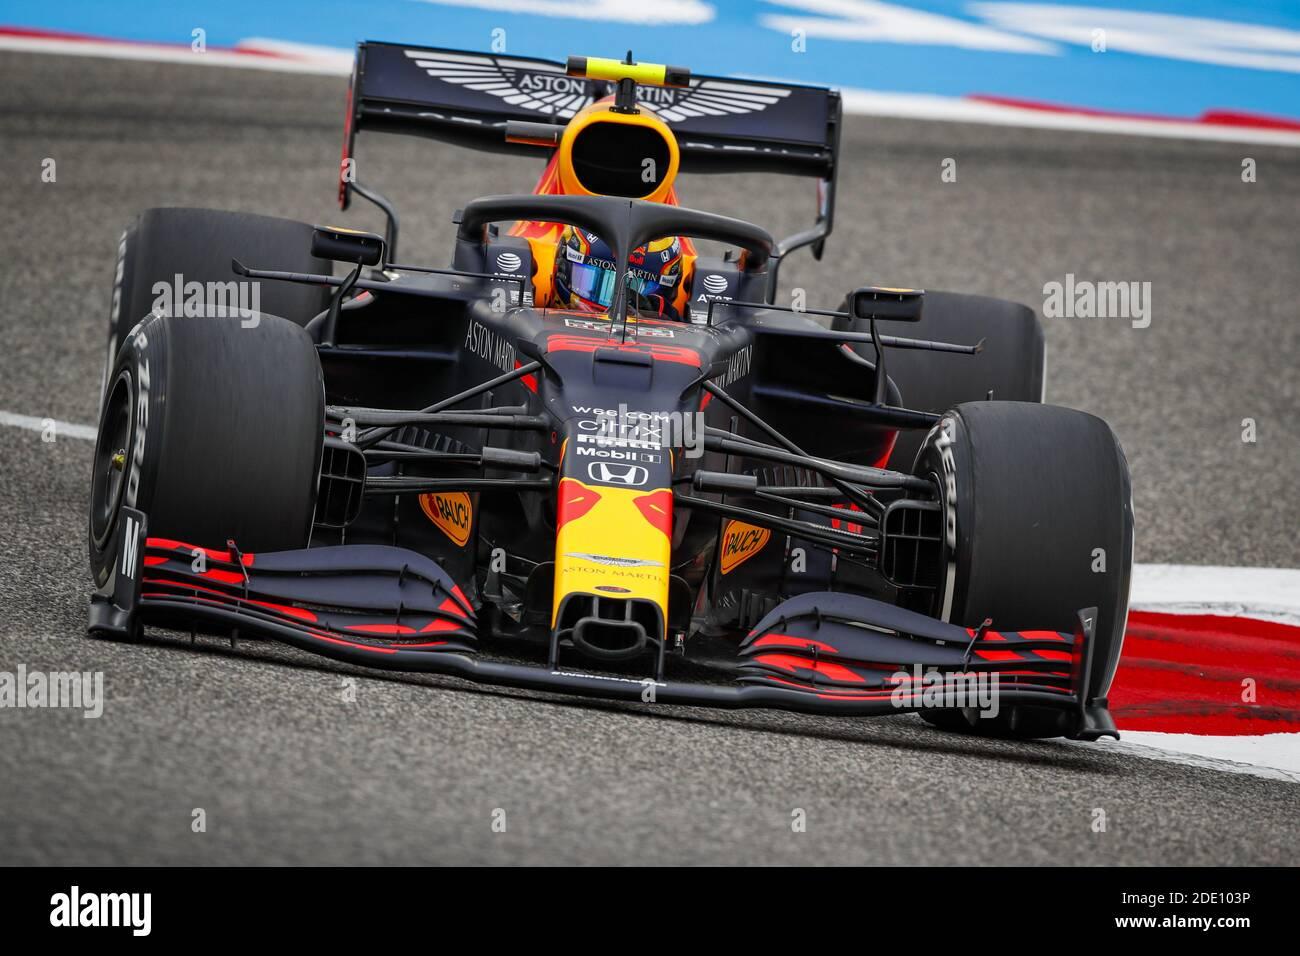 Albon Alexander Tha Aston Martin Red Bull Racing Honda Rb16 Action During The Formula 1 Gulf